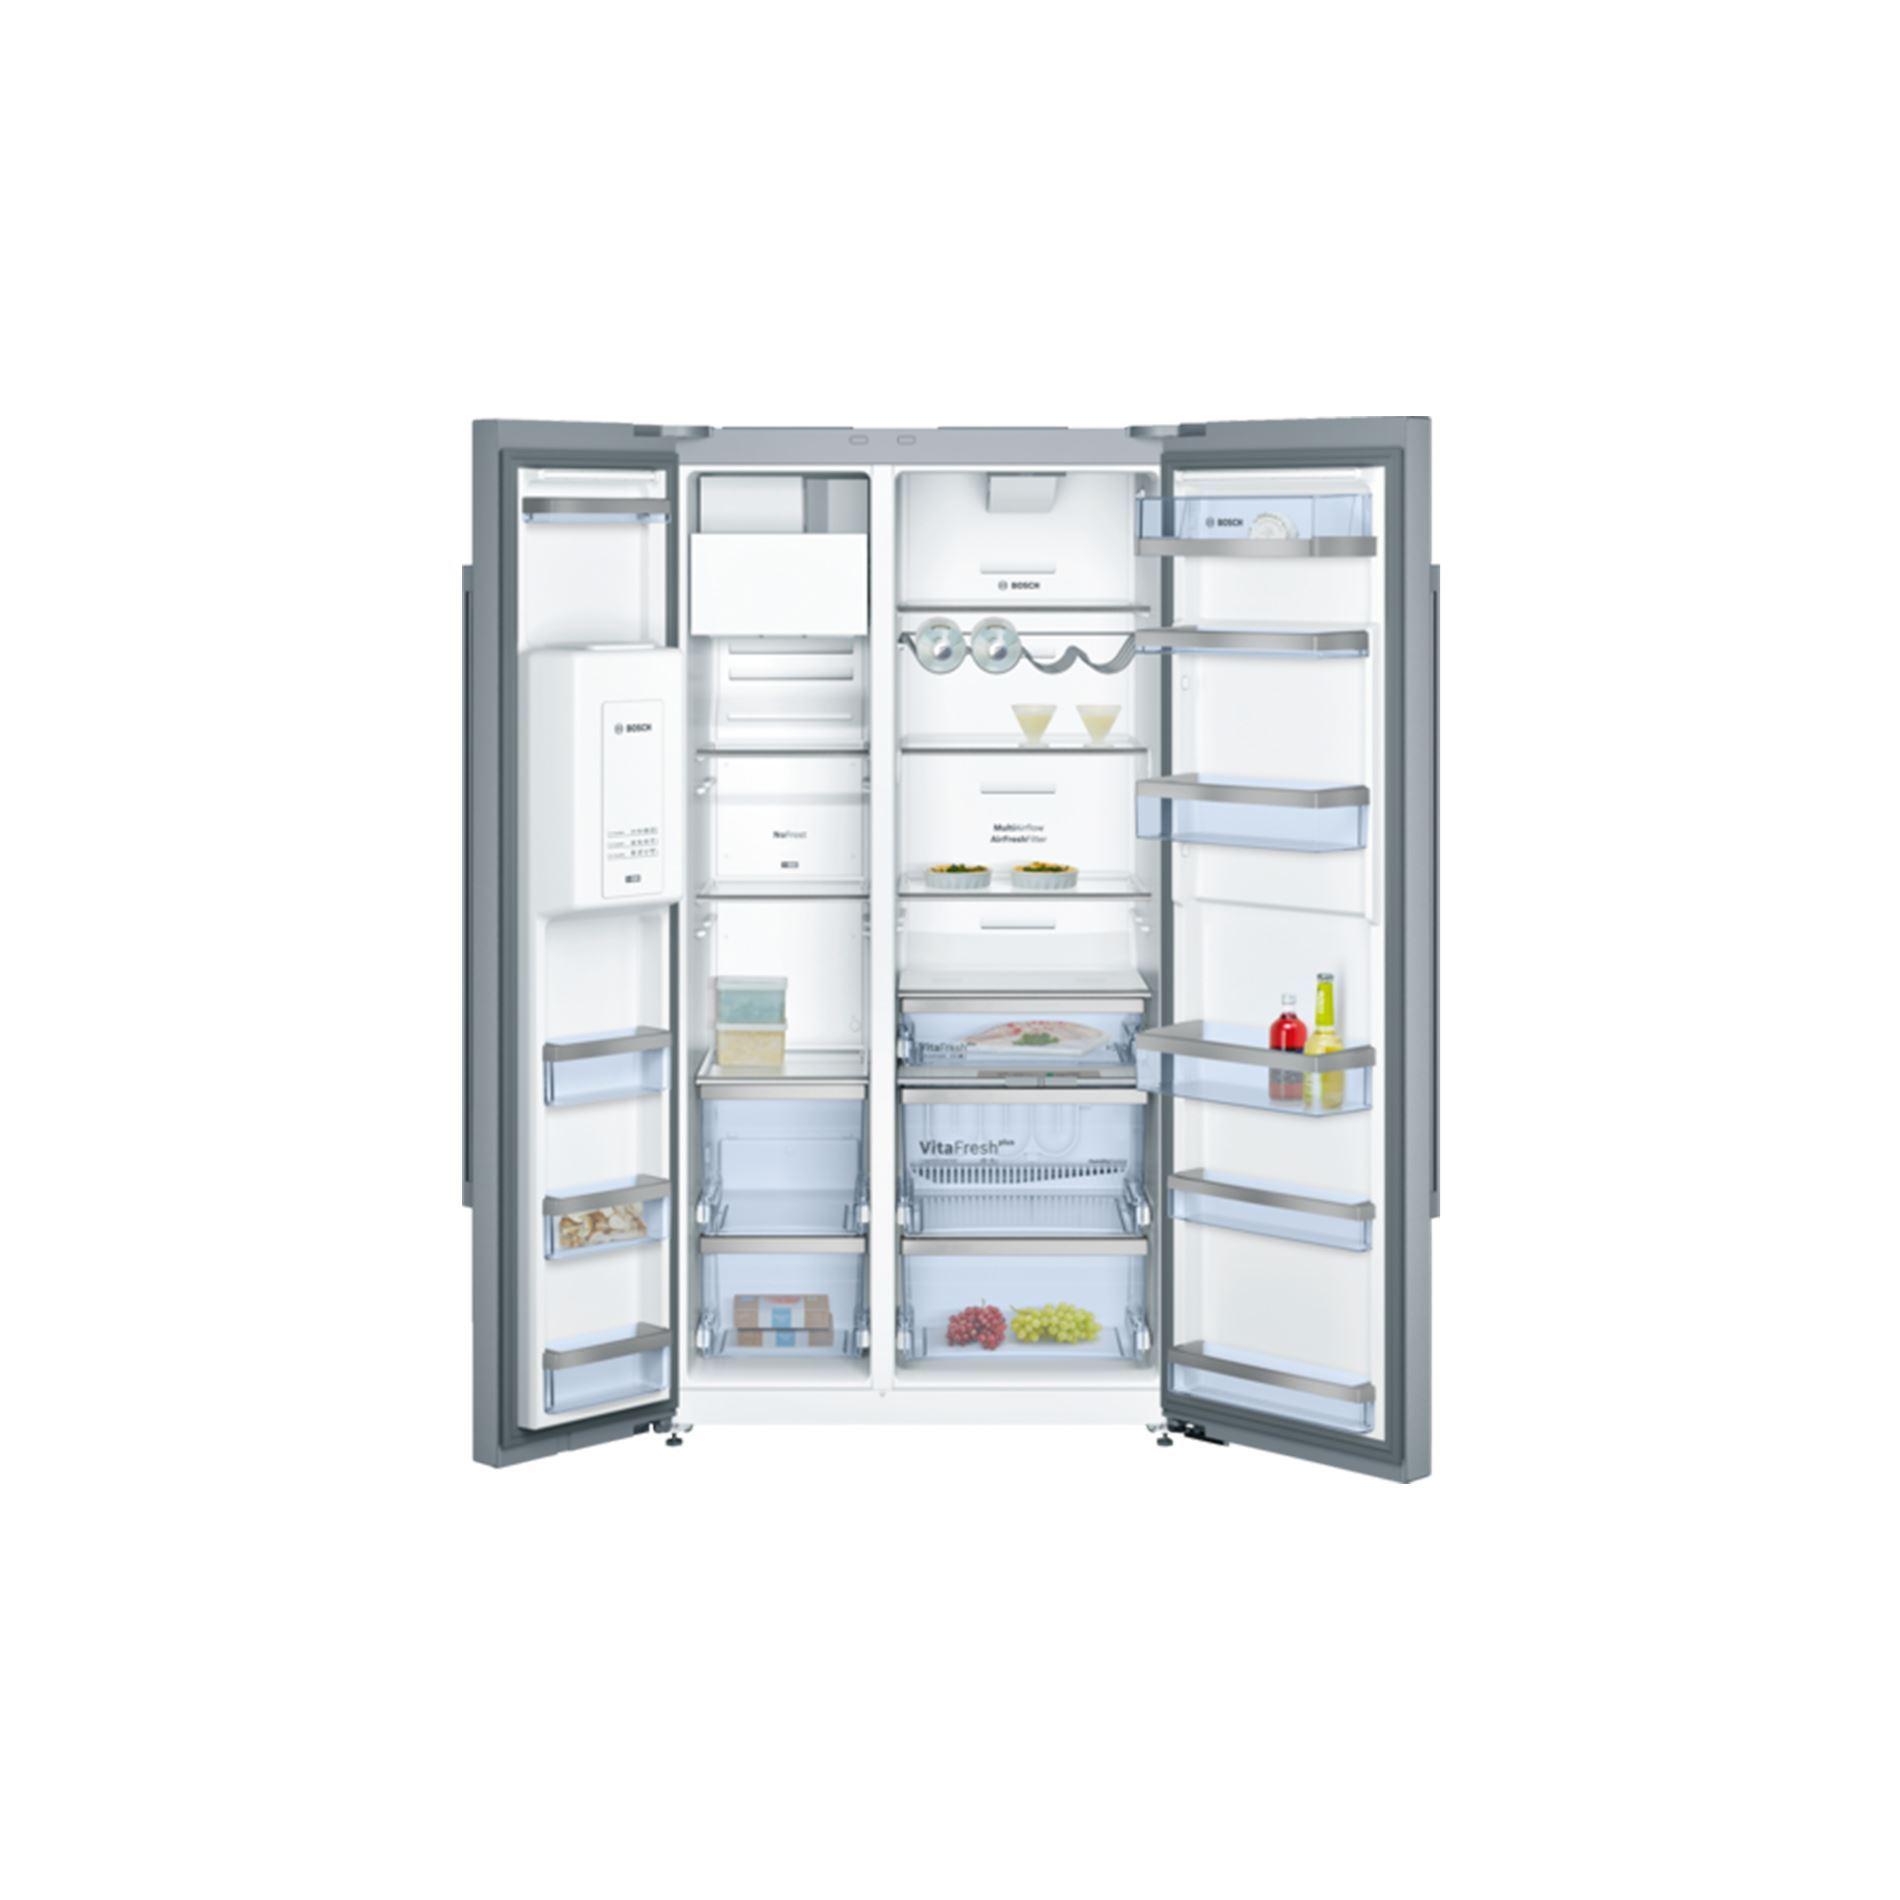 bosch kad92ai20g american style fridge freezer. Black Bedroom Furniture Sets. Home Design Ideas